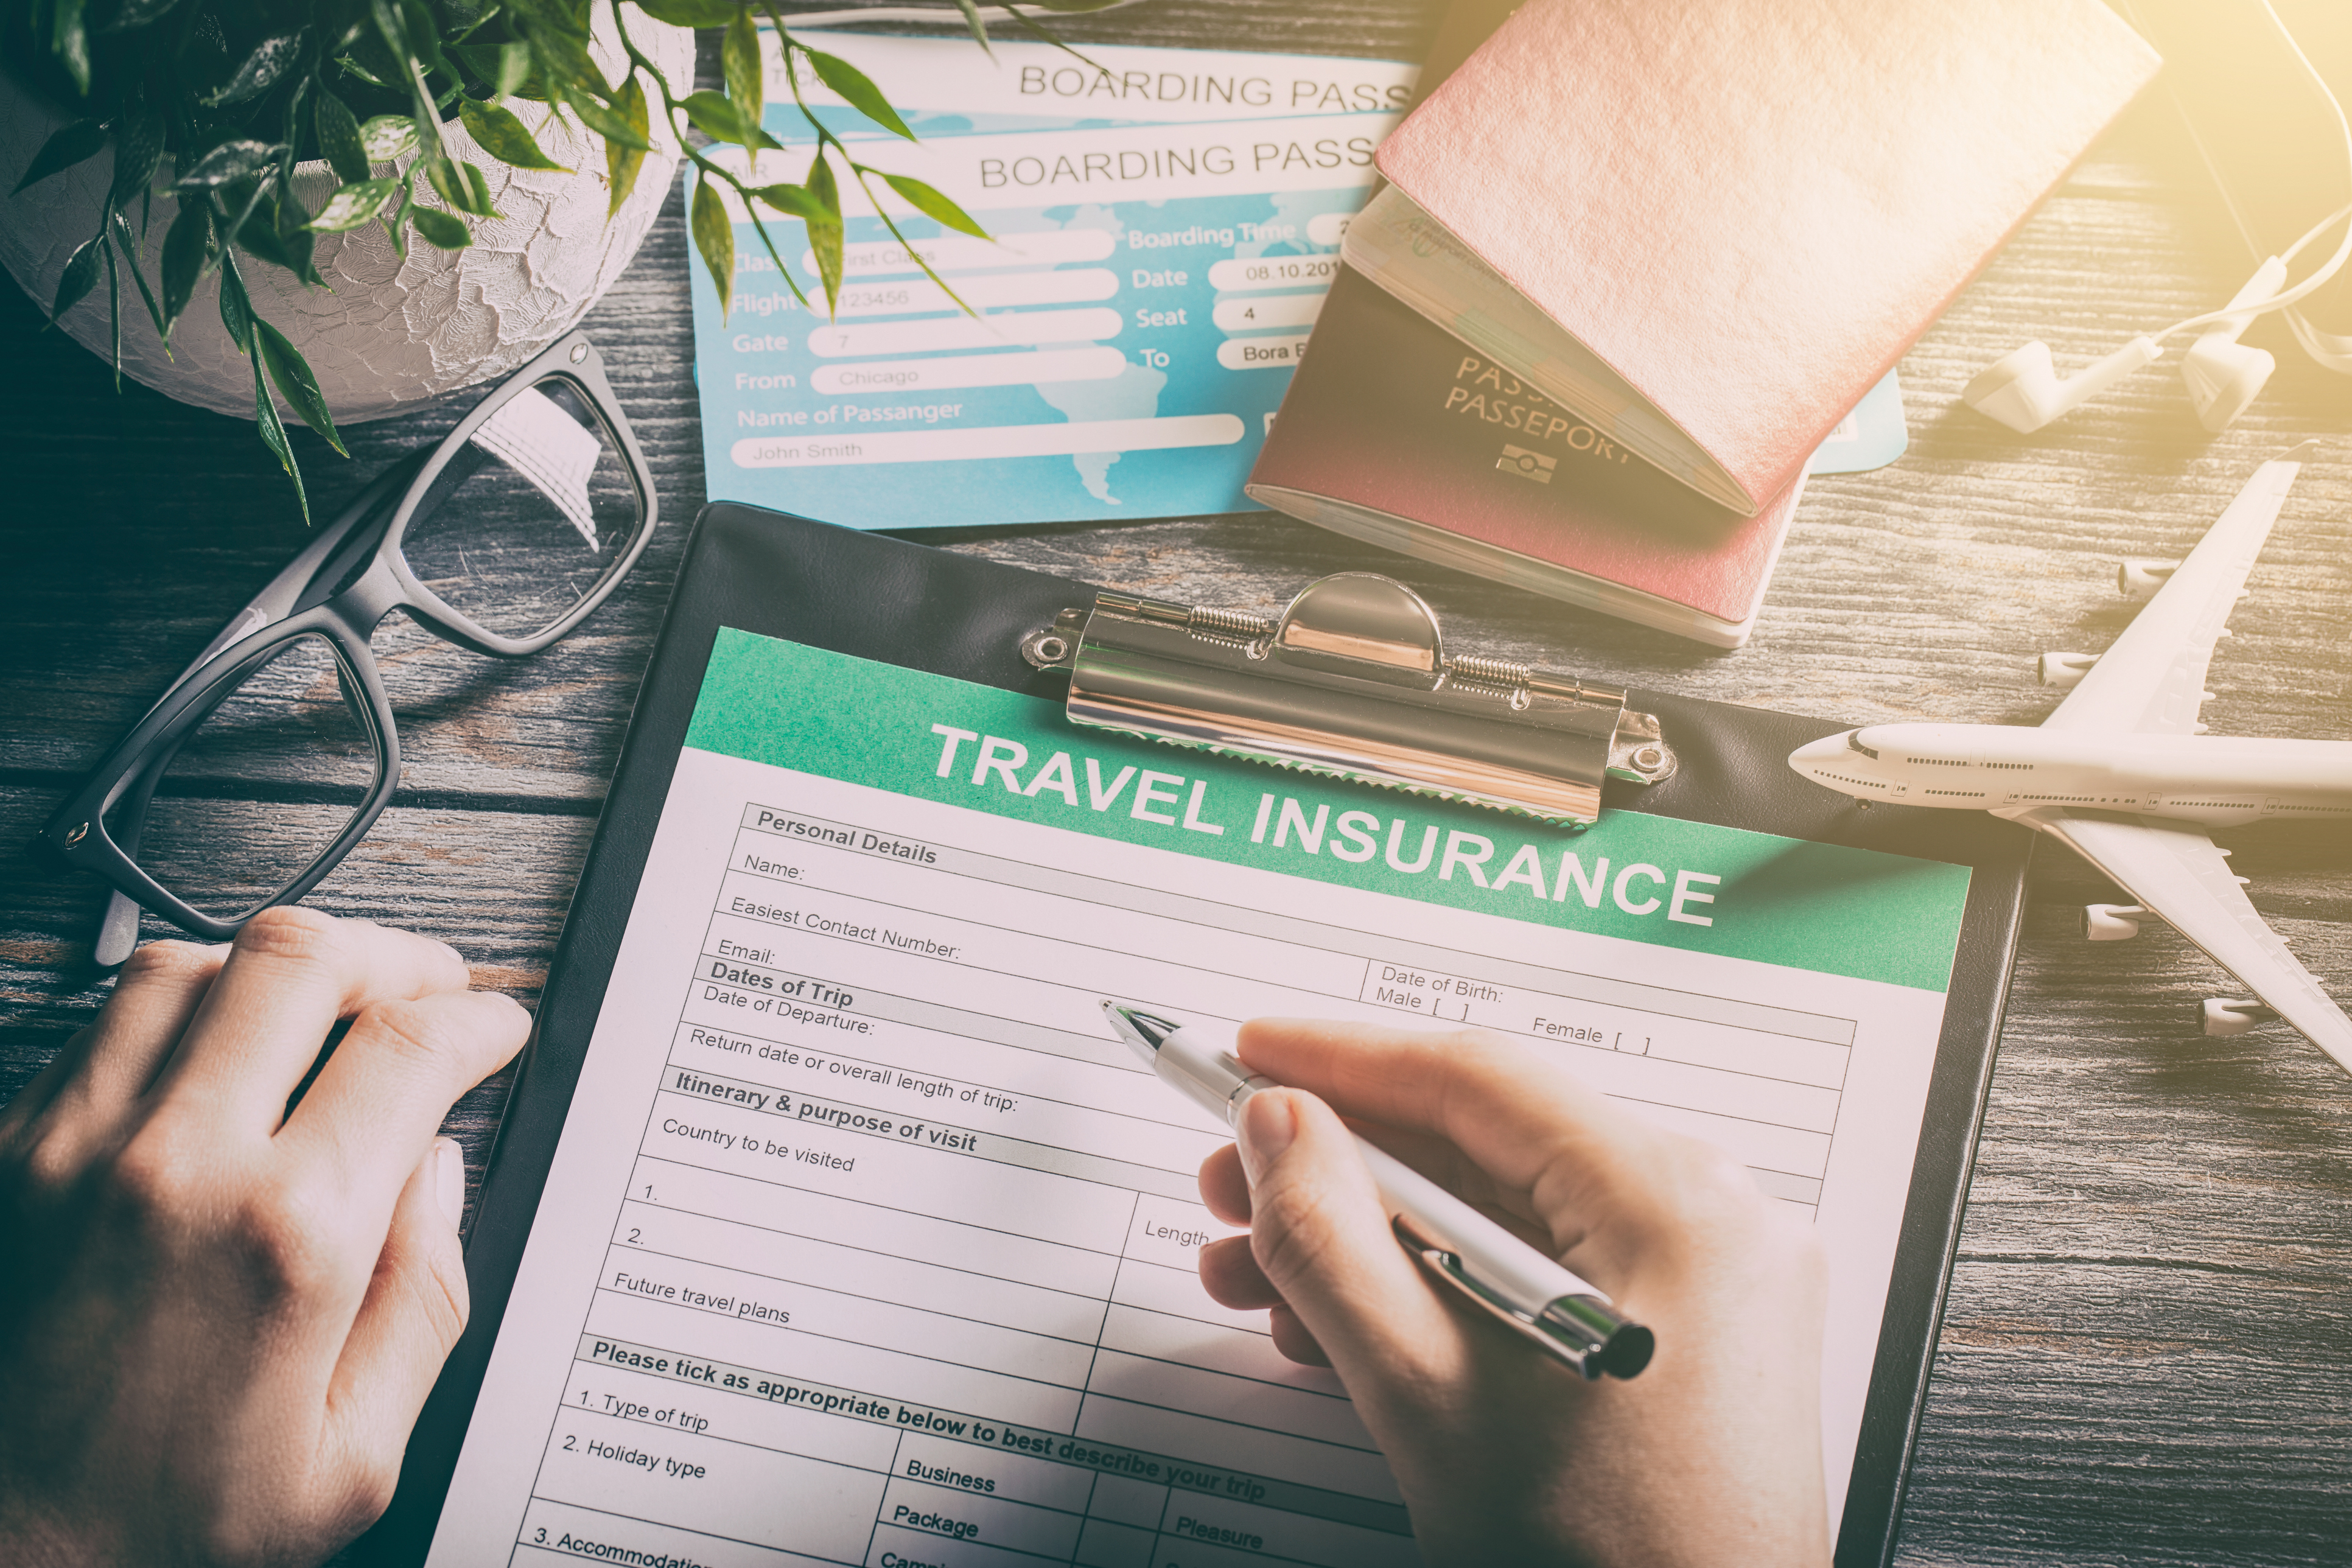 Reiseversicherung-itravel-ERGO-Corona-Zusatzschutz